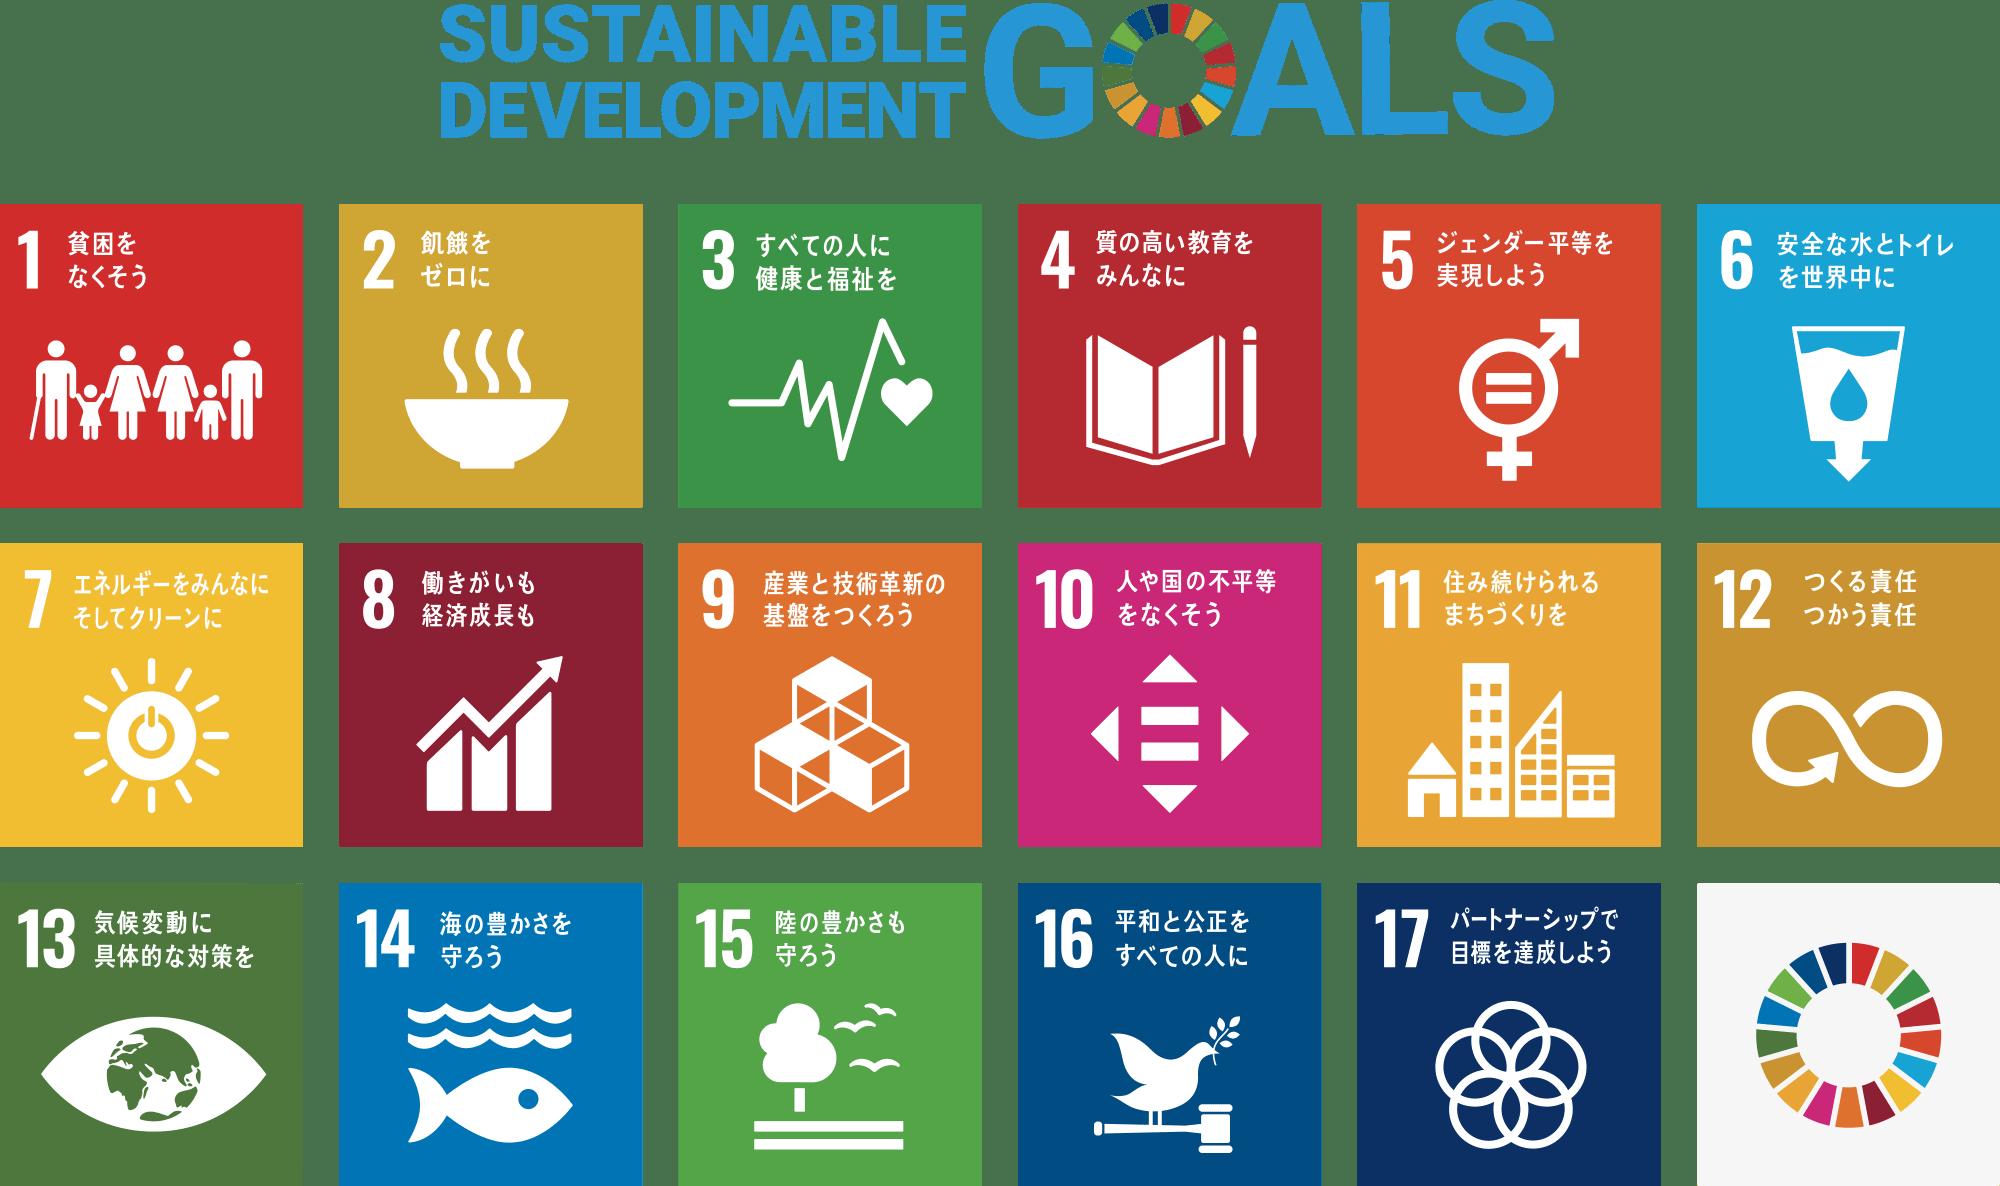 SDGs(SustainableDevelopmentGoals)